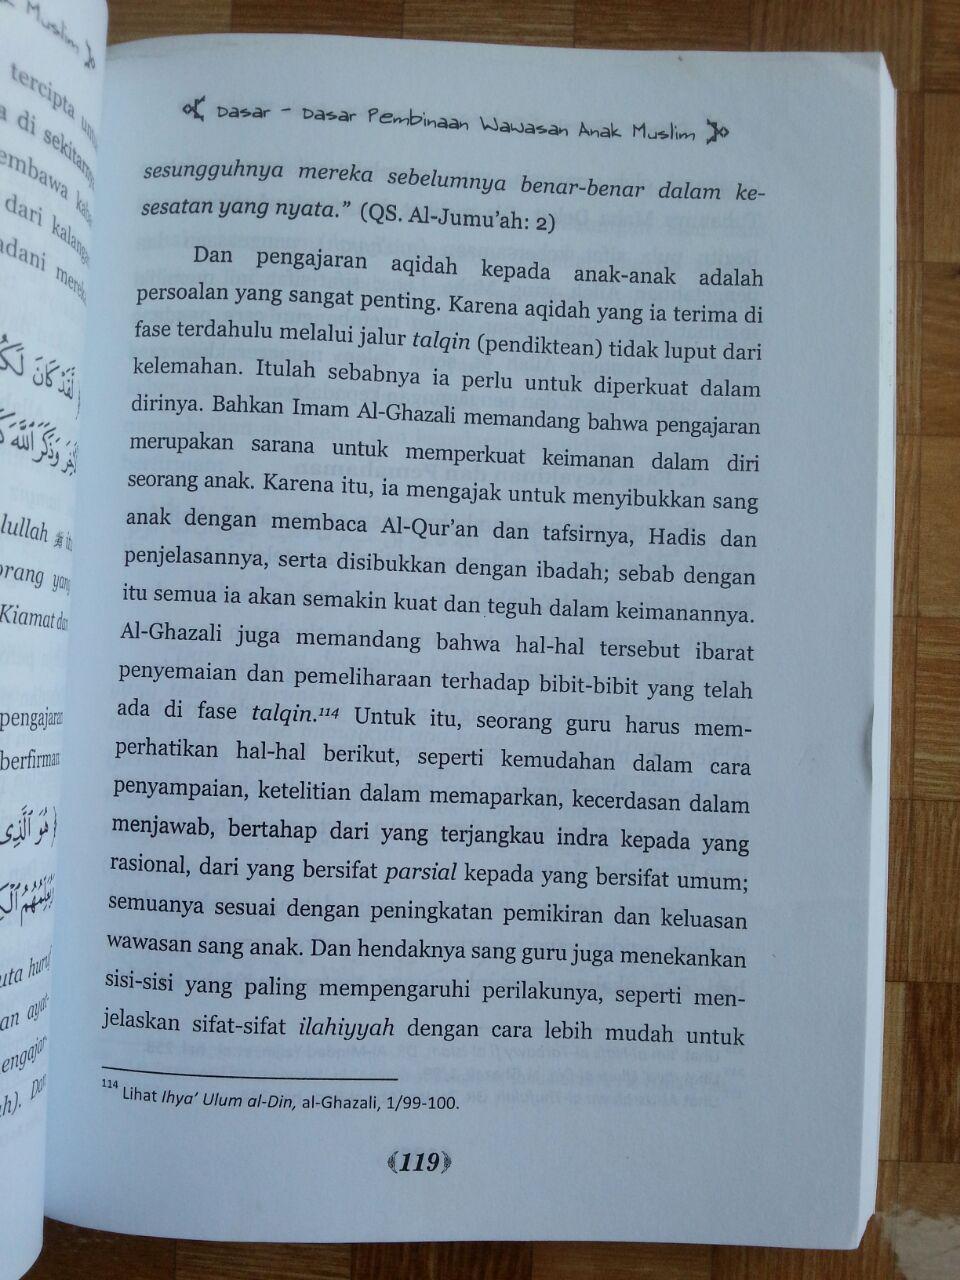 Buku Dasar-Dasar Pembinaan Wawasan Anak Muslim isi 4